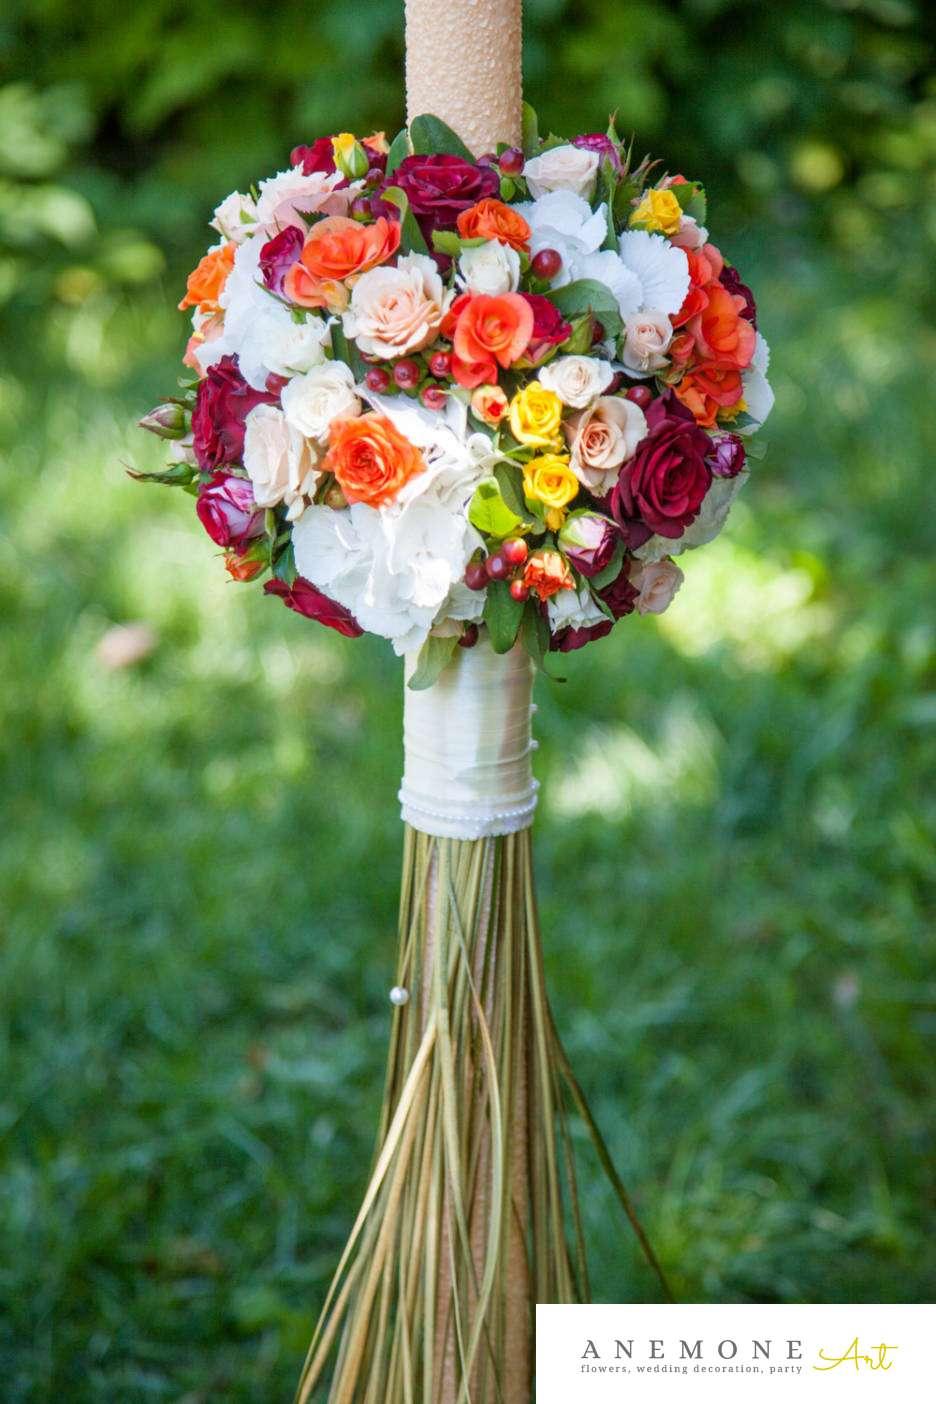 Poza, foto cu Flori de nunta auriu, glob, hipericum, hortensia, lumanare cununie, mini-rosa, multicolor, trandafiri in Arad, Timisoara, Oradea (wedding flowers, bouquets) nunta Arad, Timisoara, Oradea